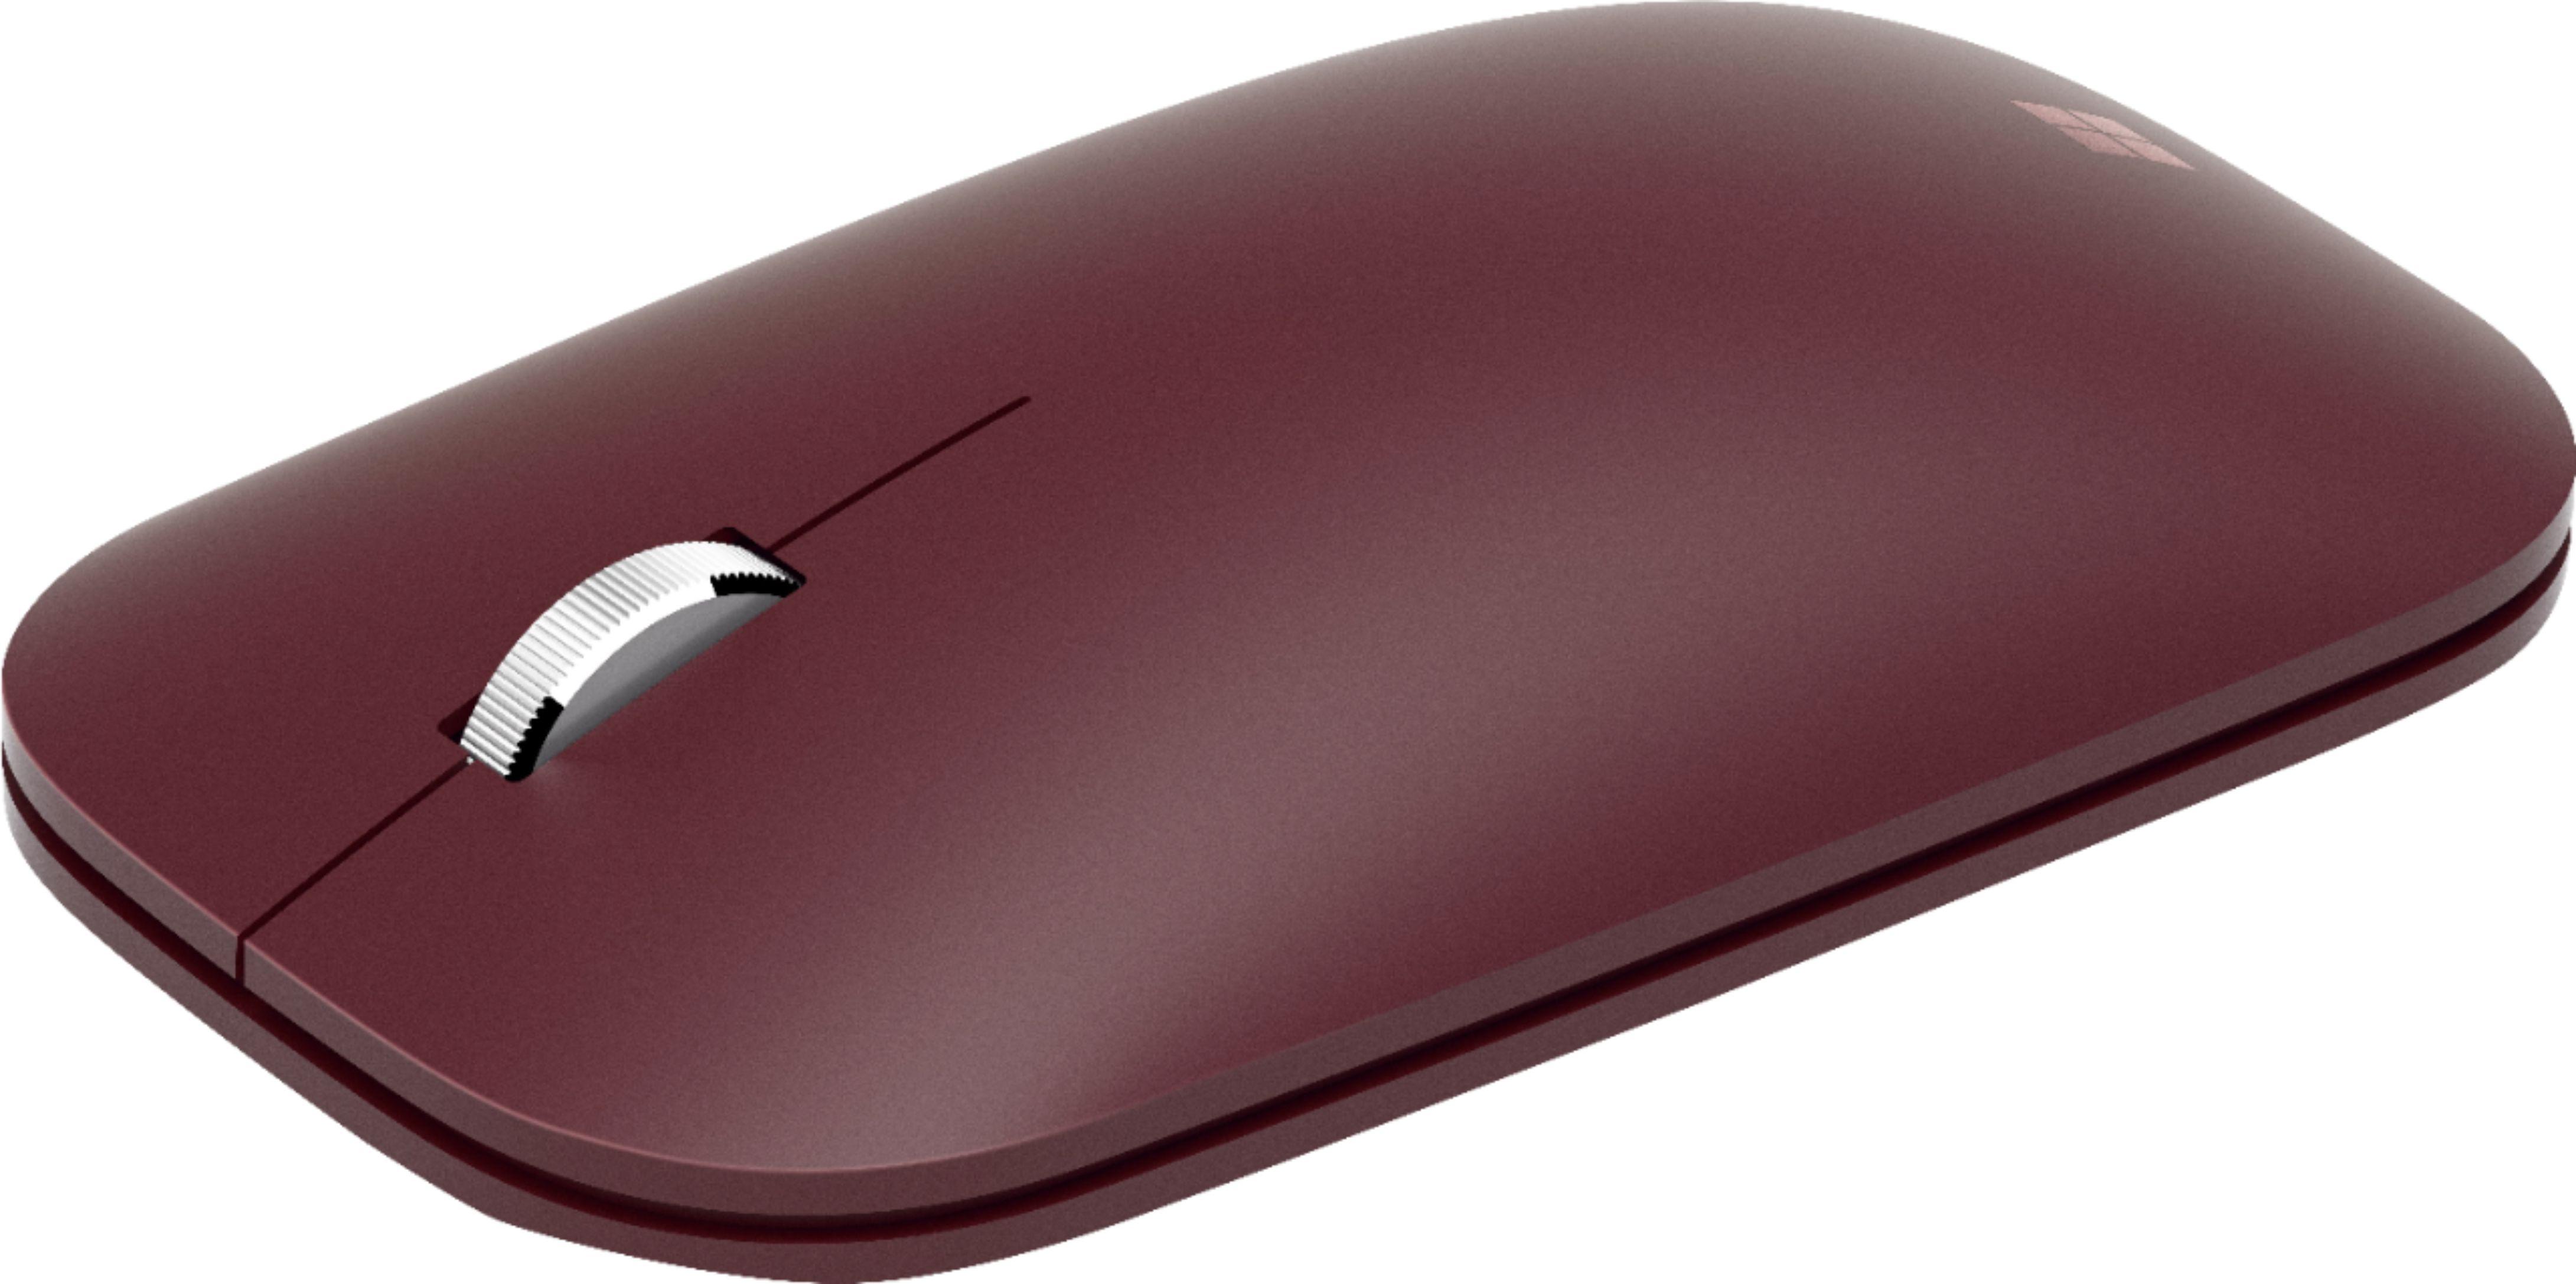 Microsoft KGY-00011 largeFrontImage